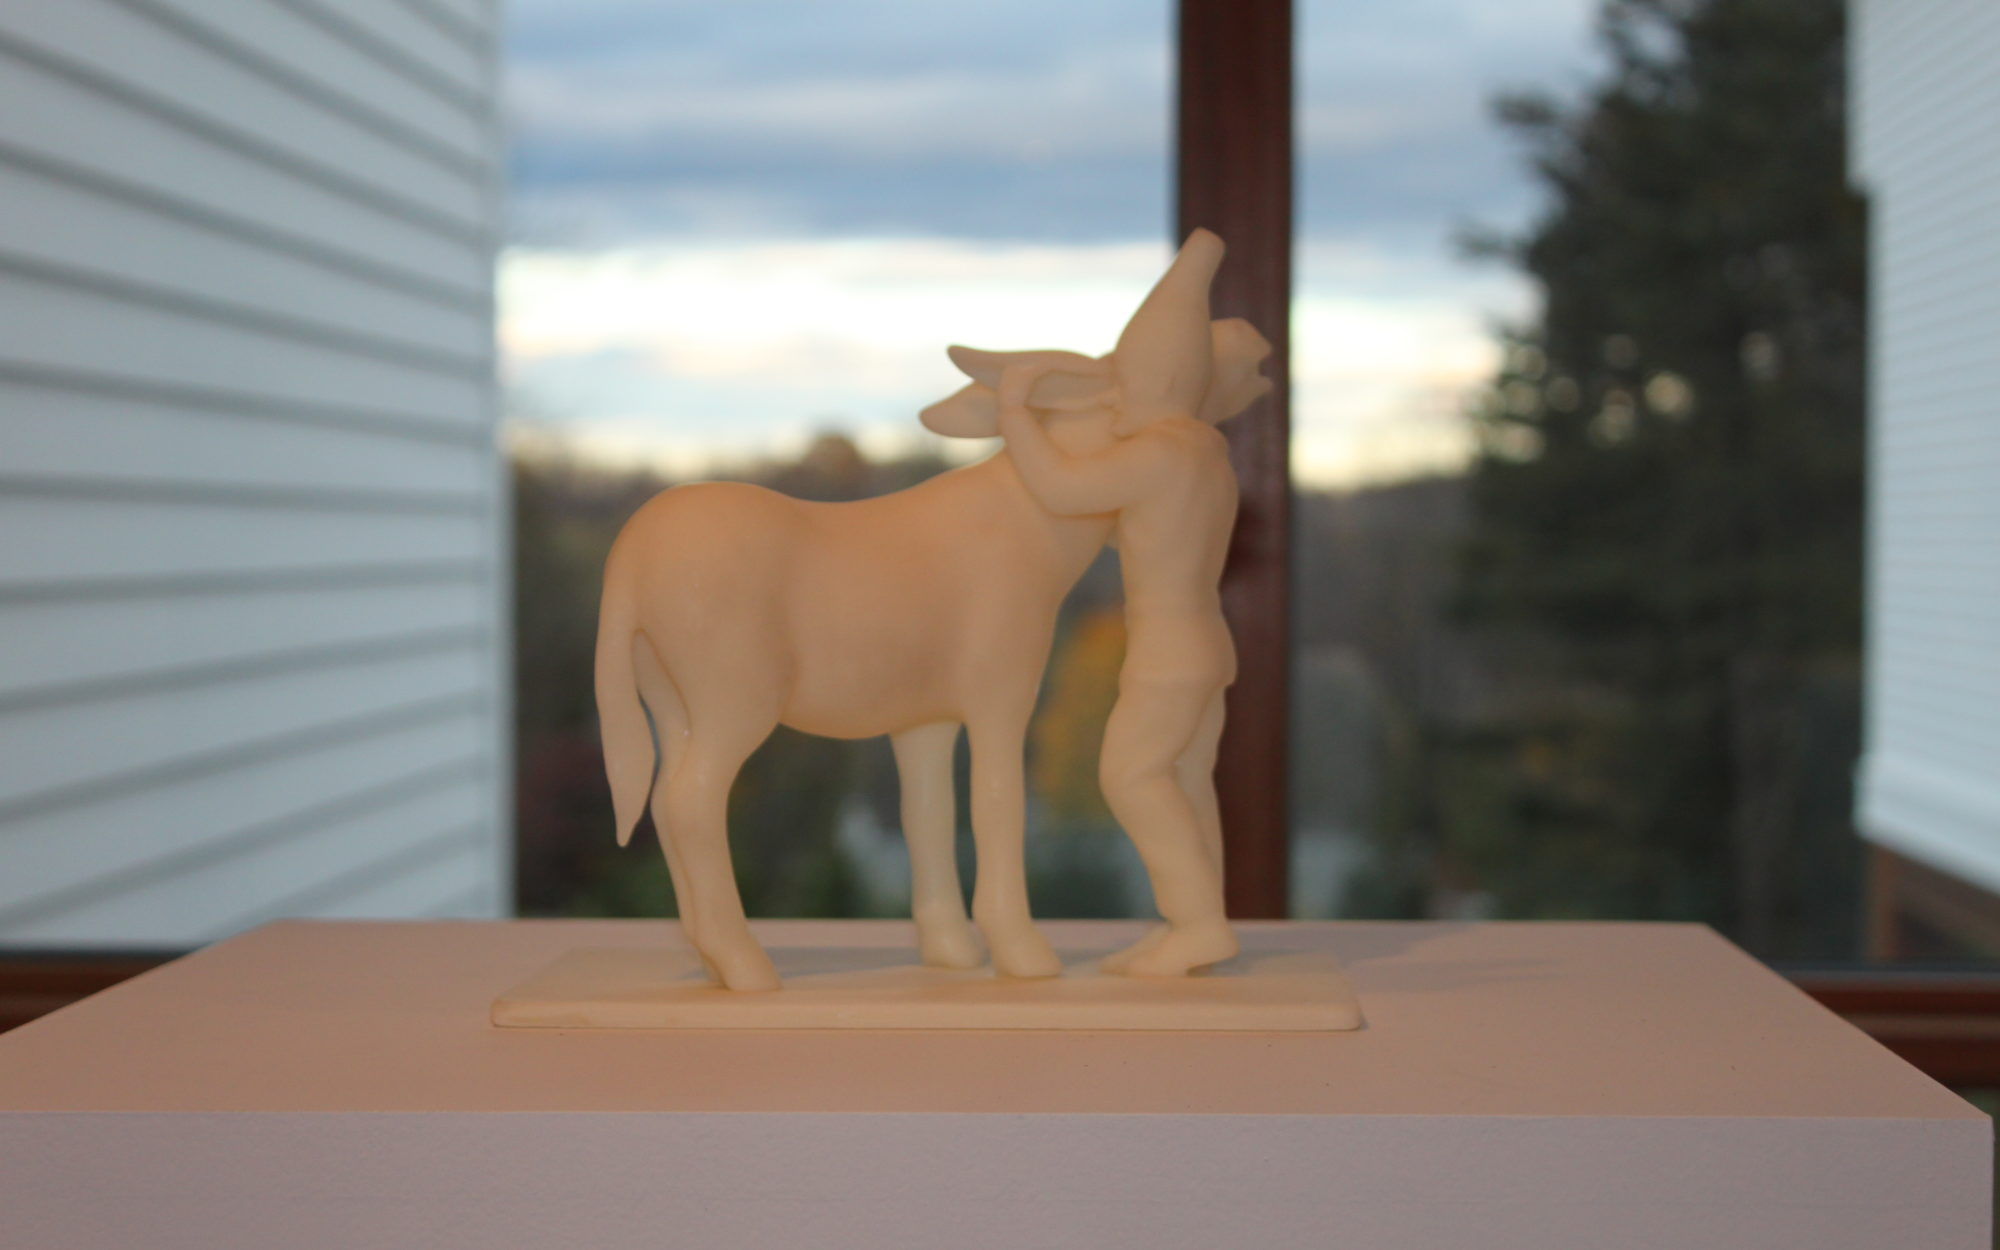 Small figurine of a figure hugging a horse